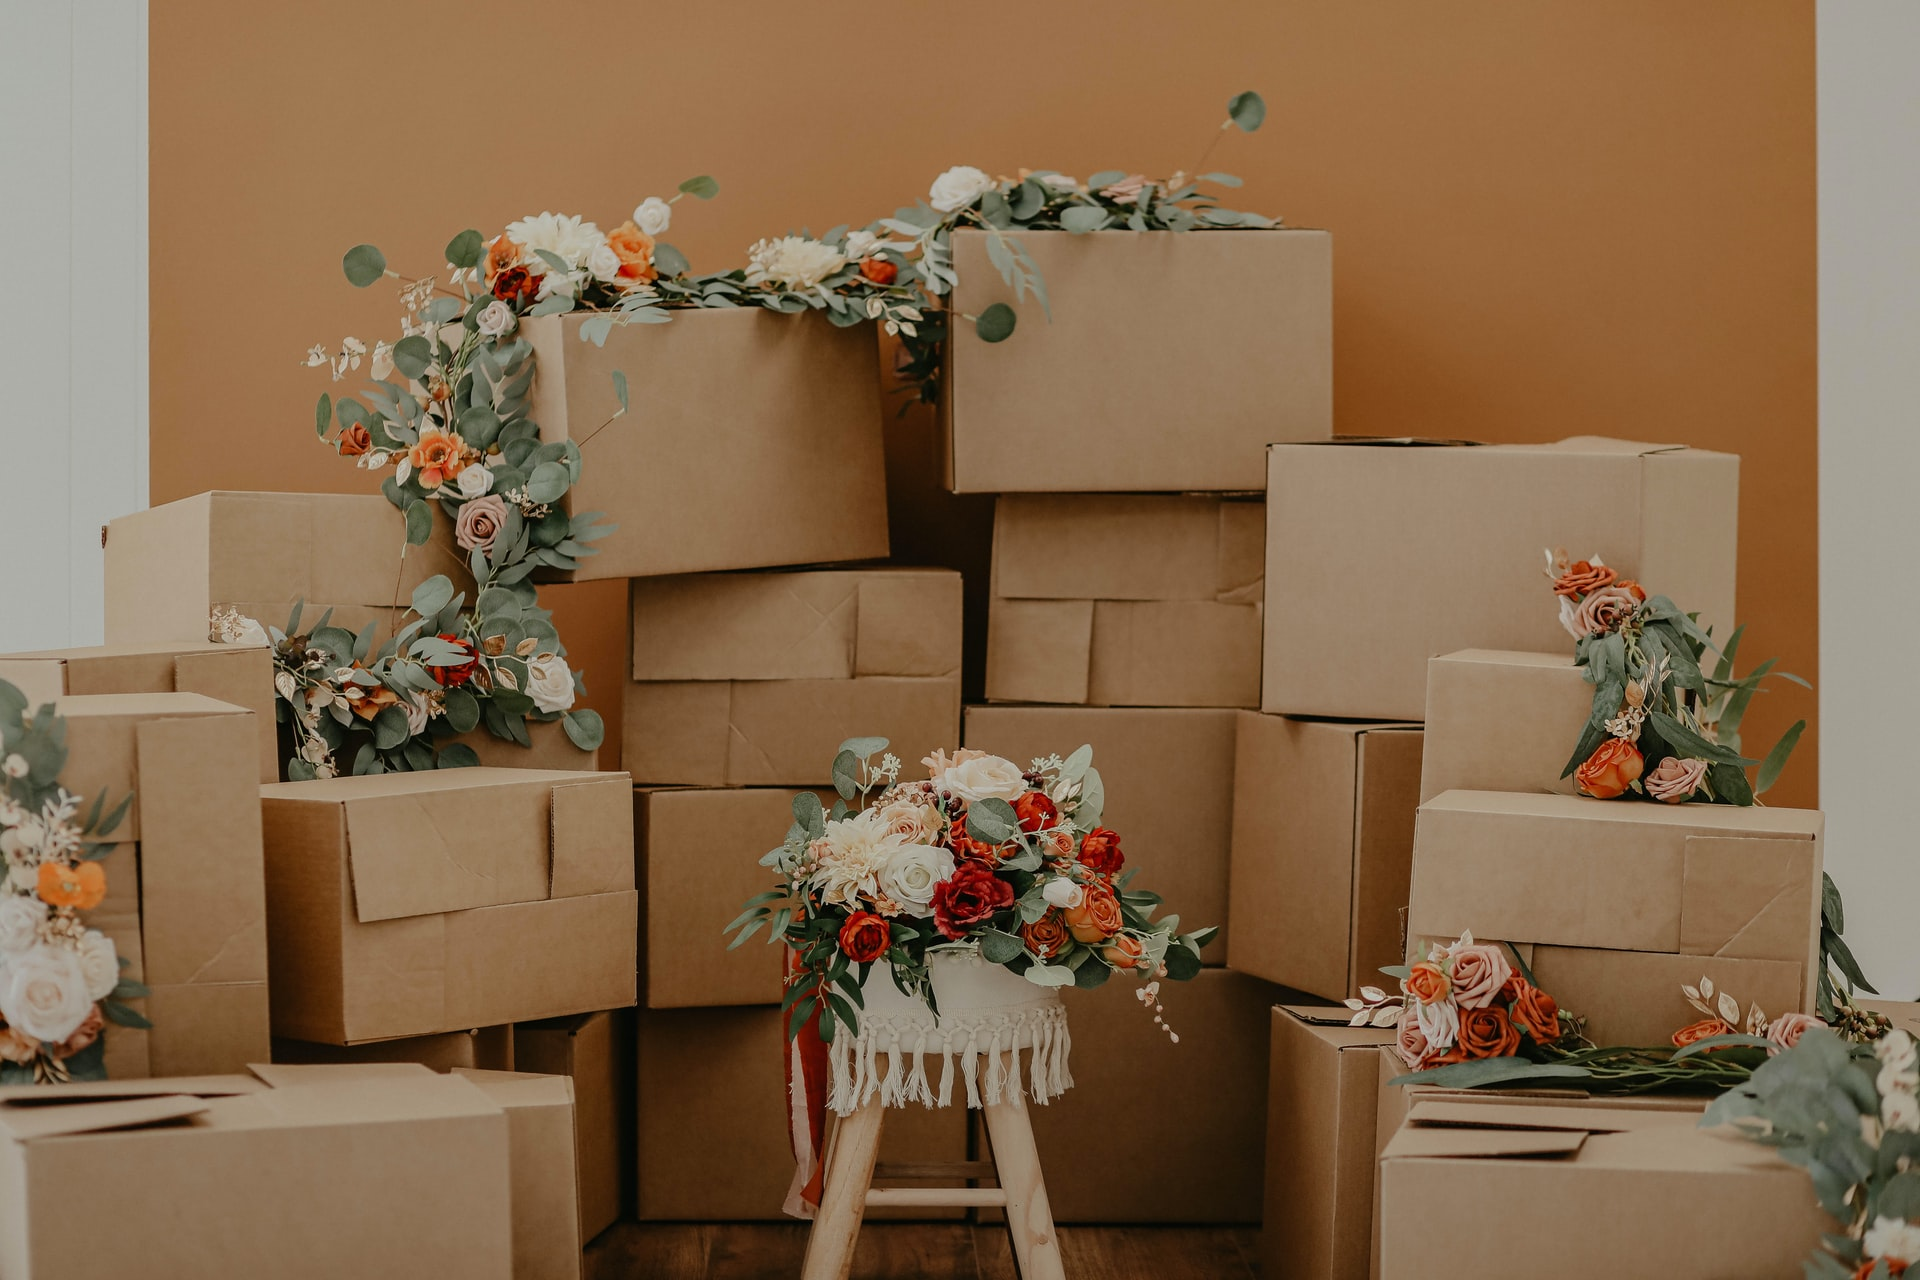 Plastic Bins Vs Cardboard Boxes: The Ultimate Guide